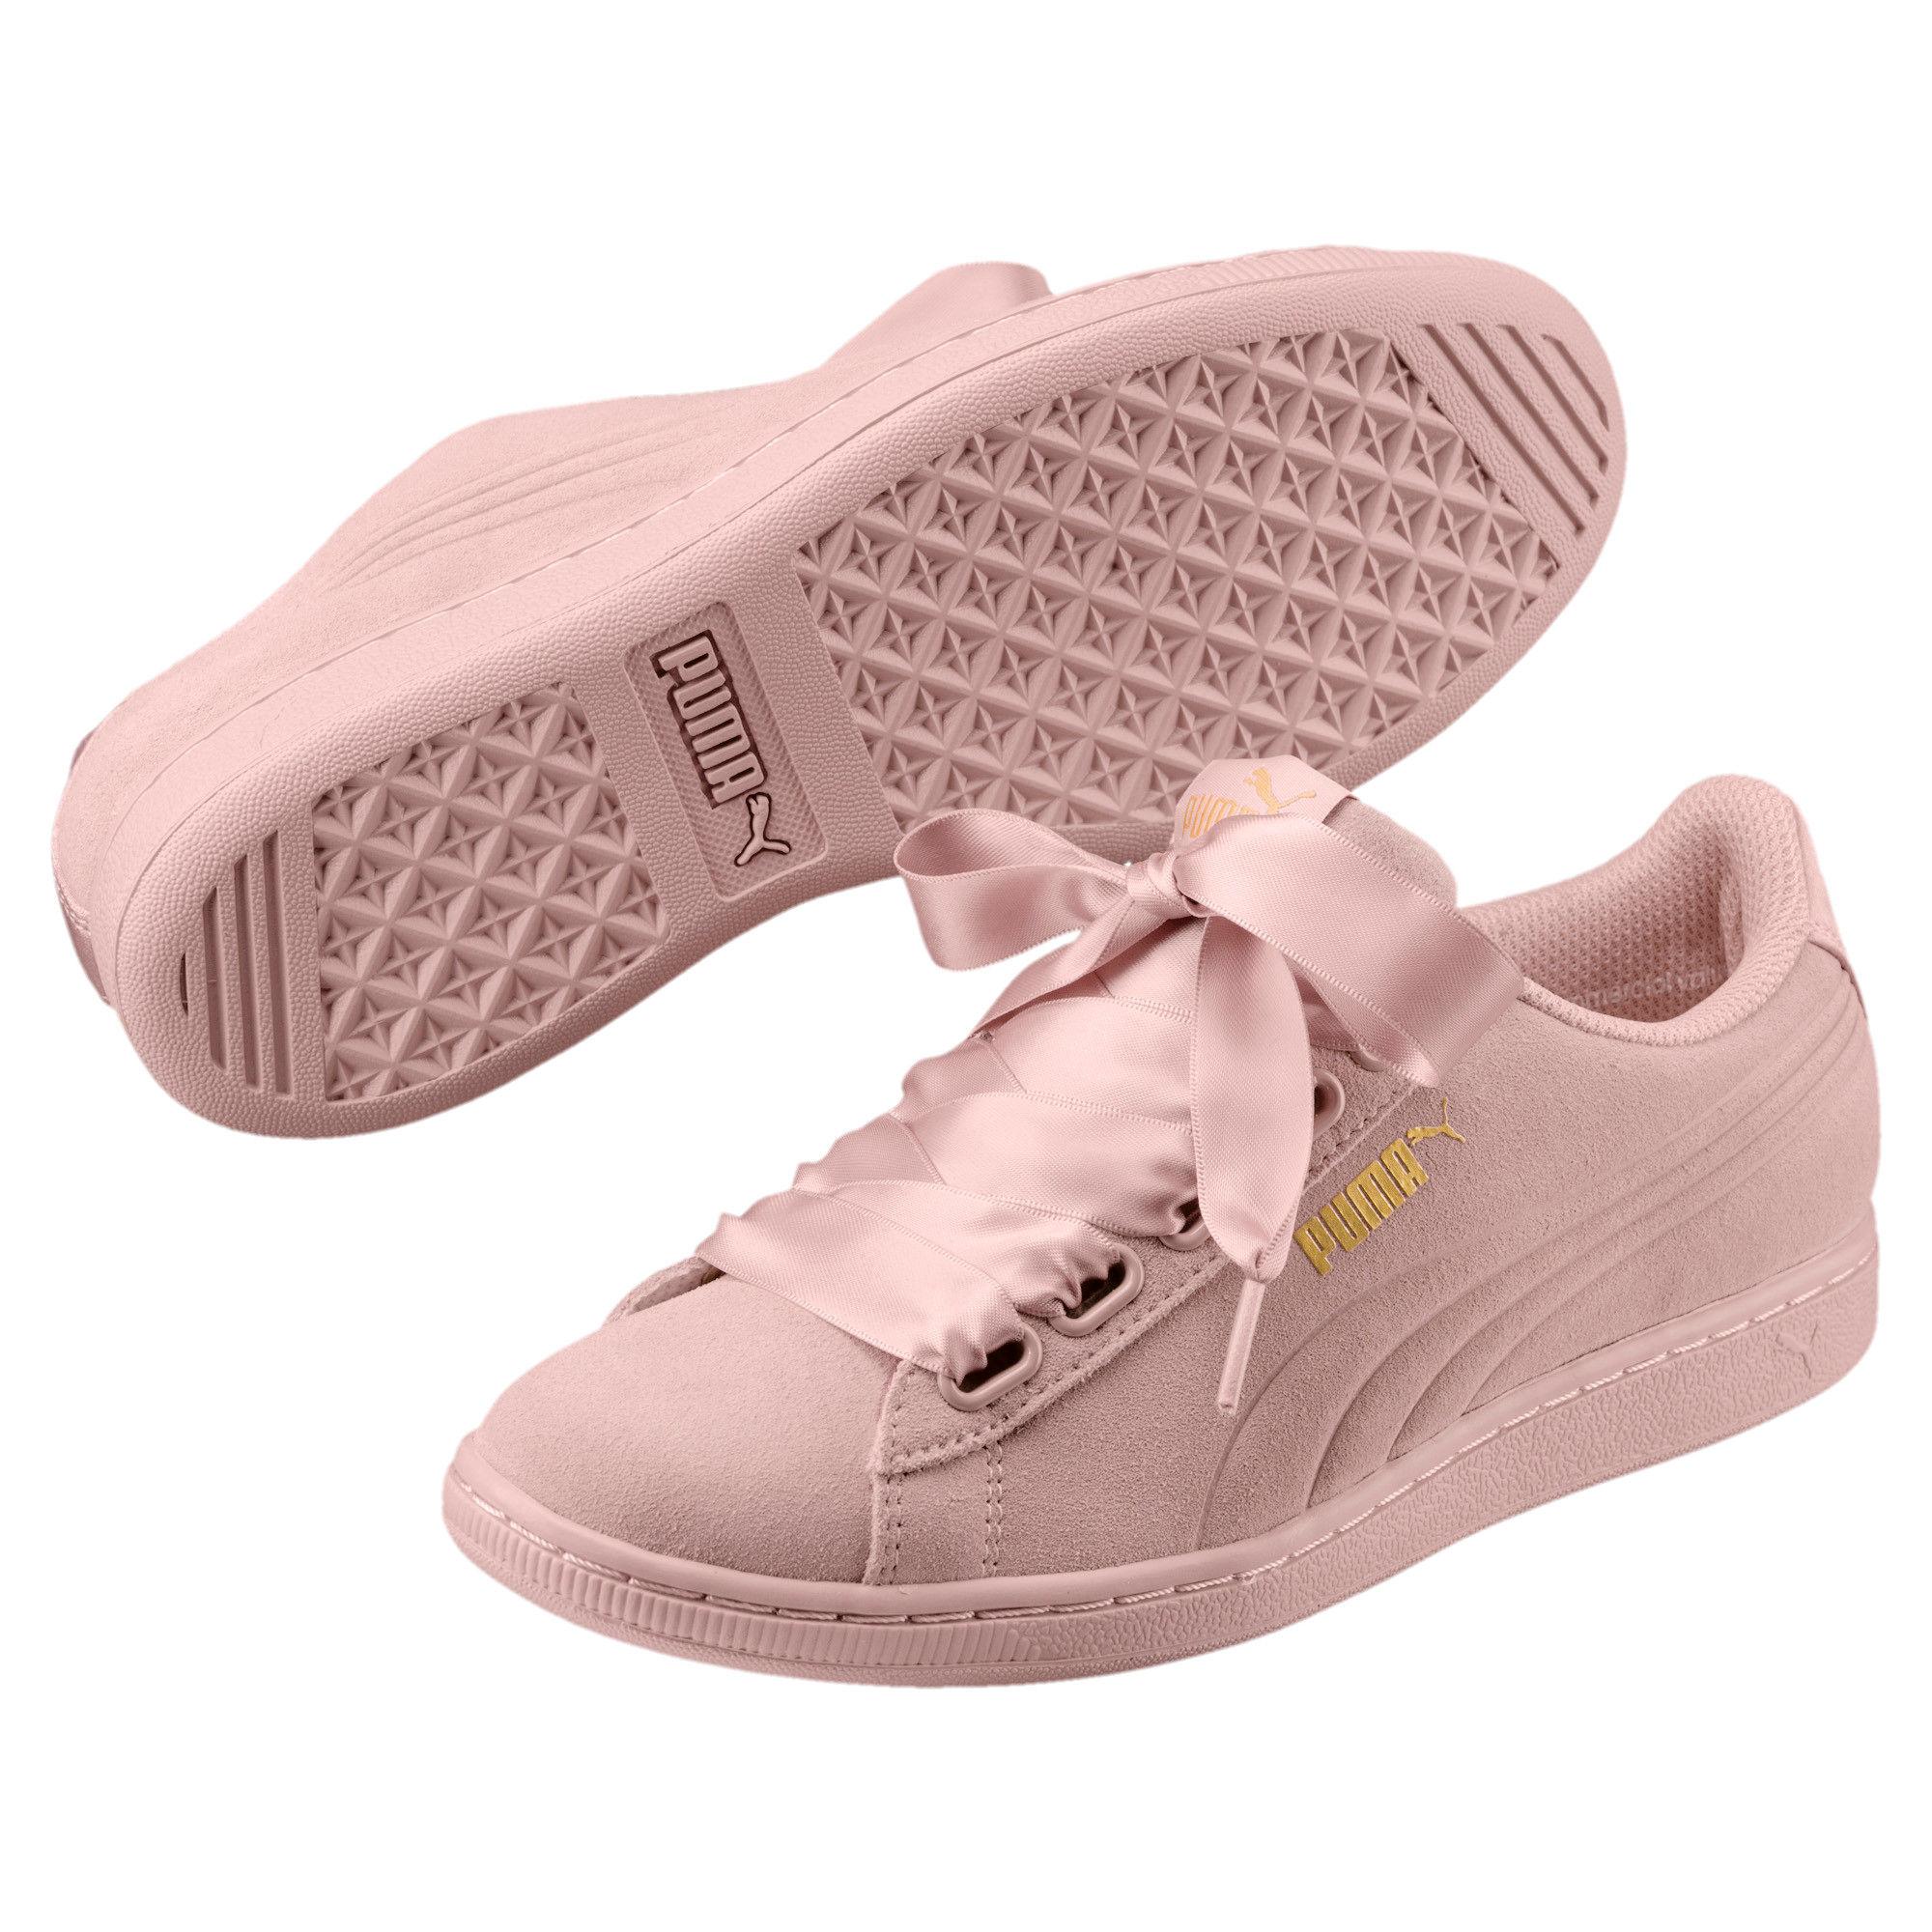 Puma Vikky Ribbon S Sneaker: Buy Puma